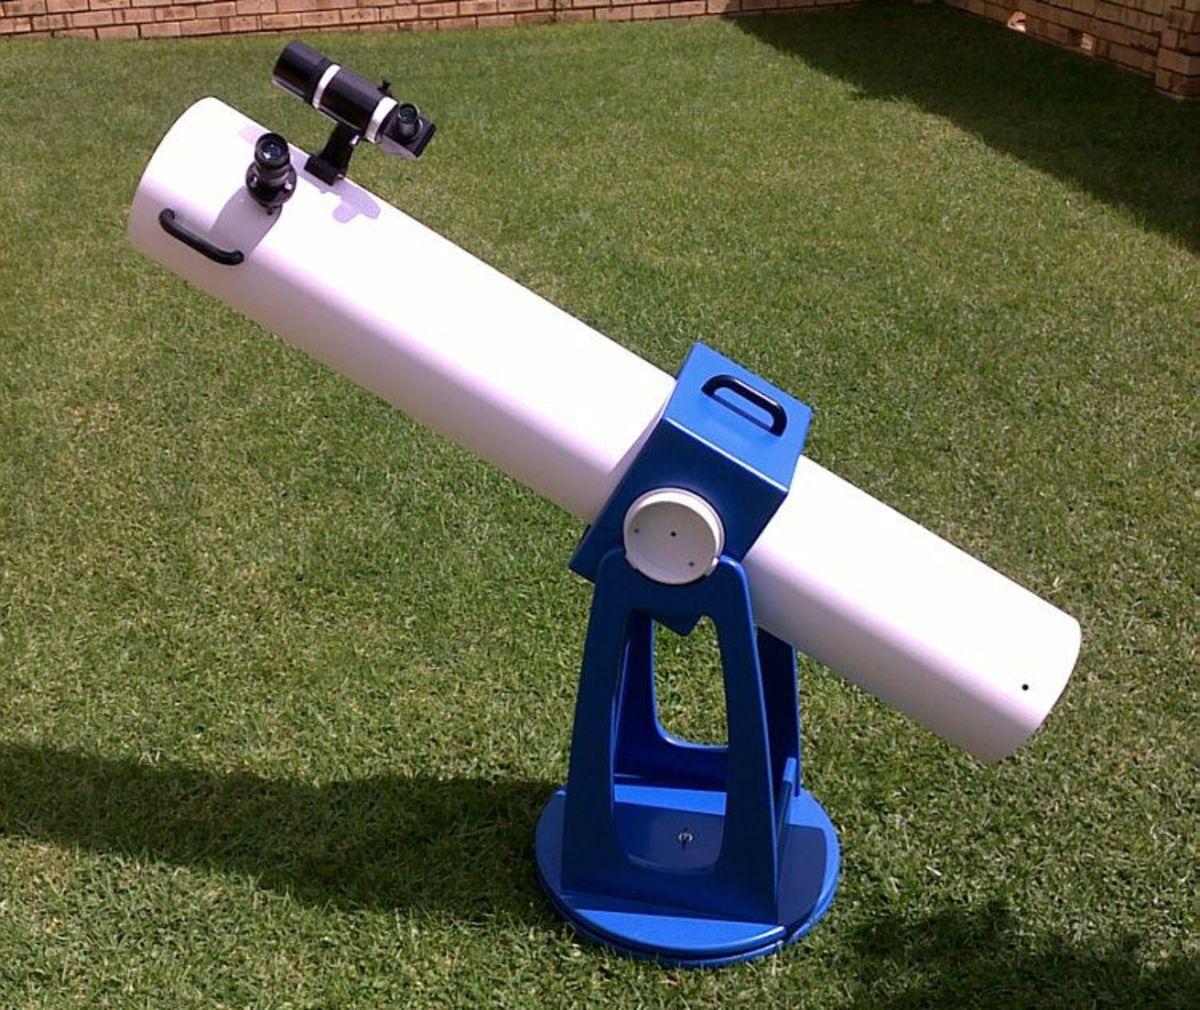 skylar.co.za DIY 150mm Newtonian telescope. Built over 8 months in 2009/2010.